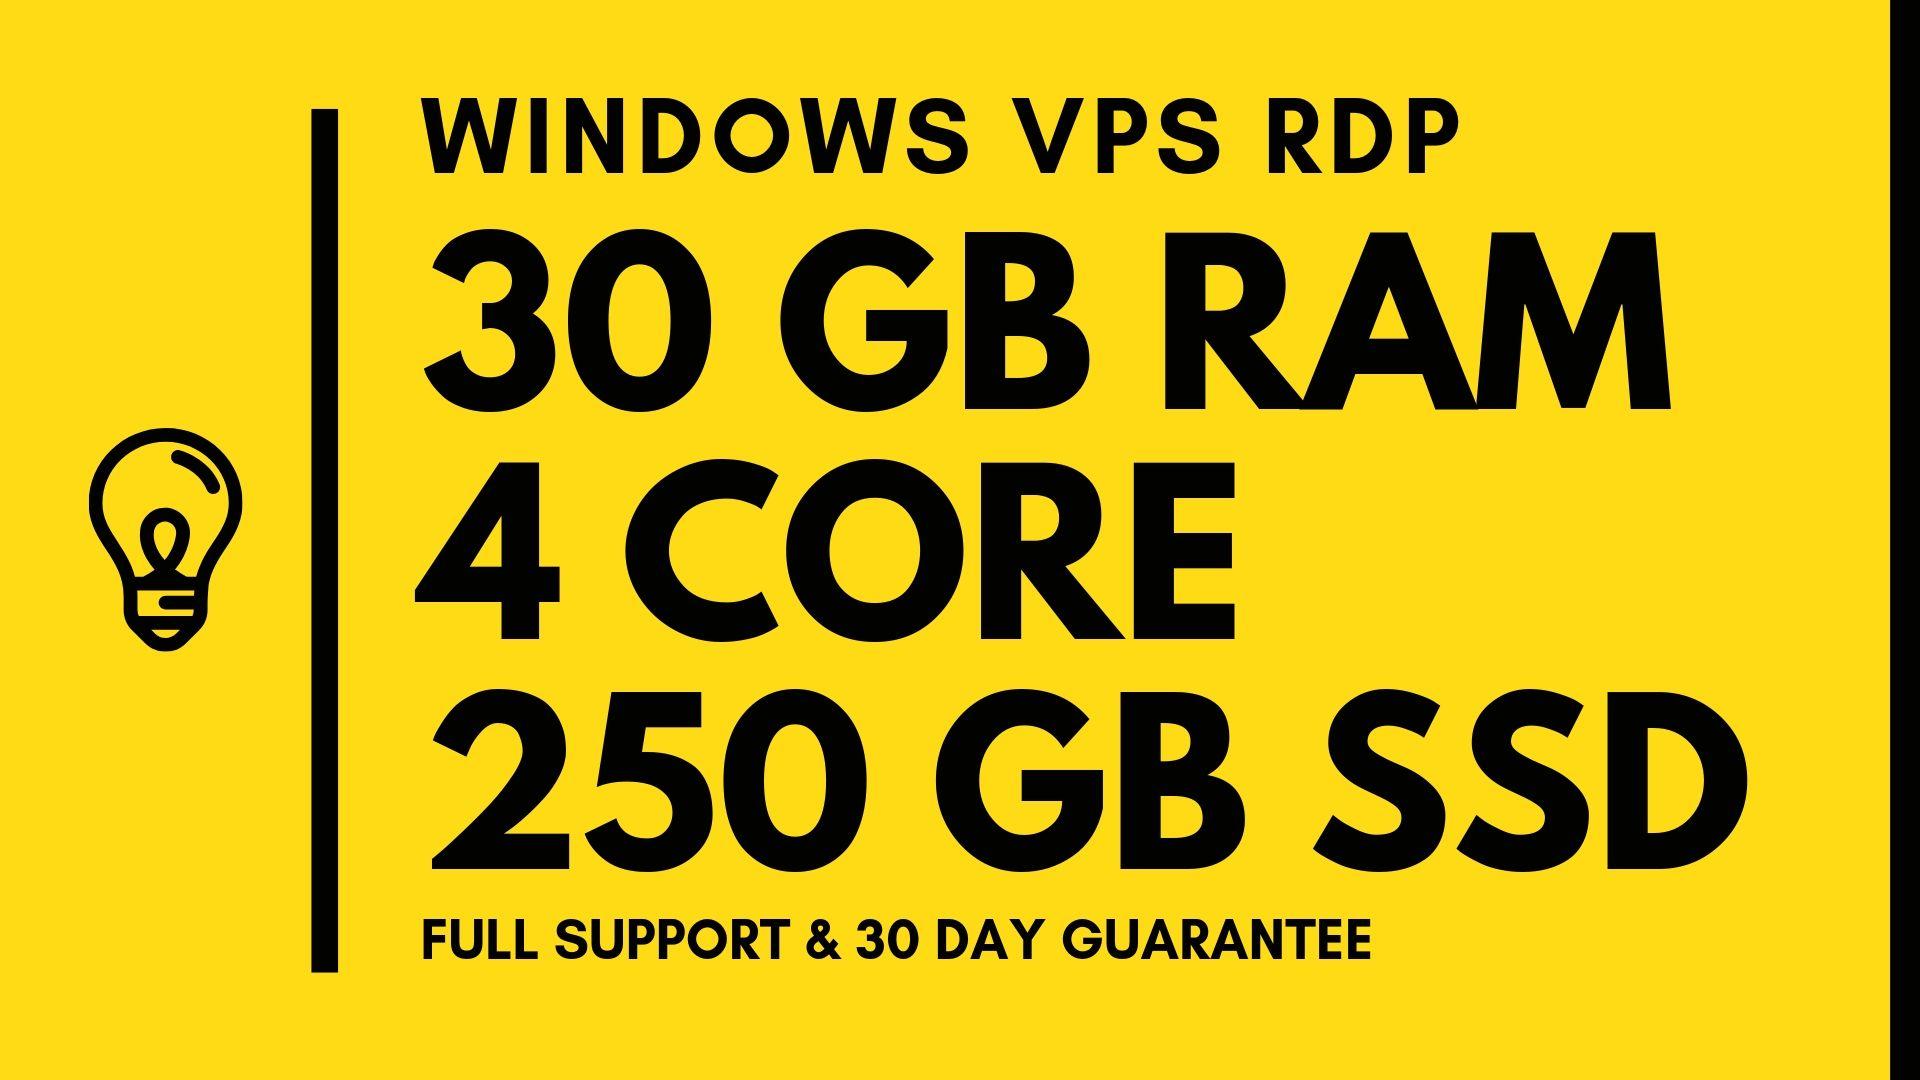 Windows VPS RDP 30GB RAM 4CPUs 250GB SSD